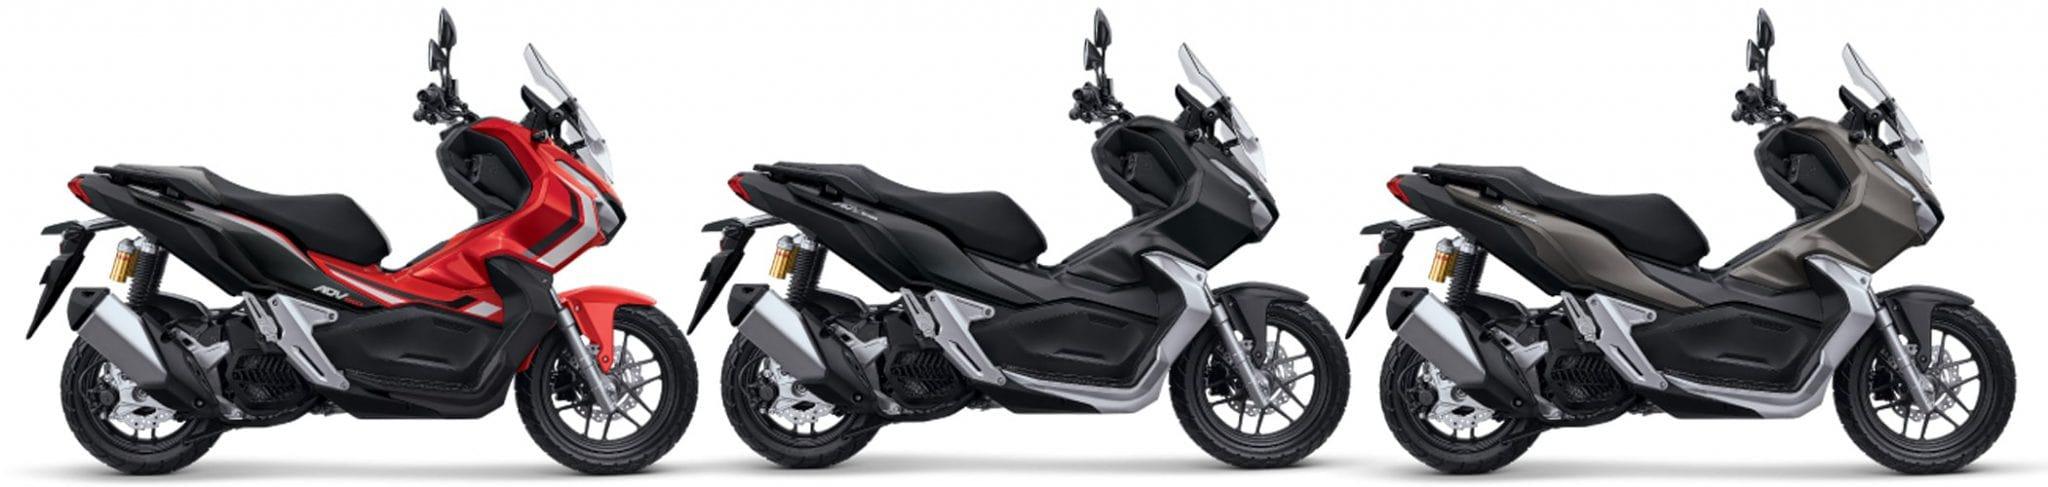 Honda ADV 150 ปี 2019